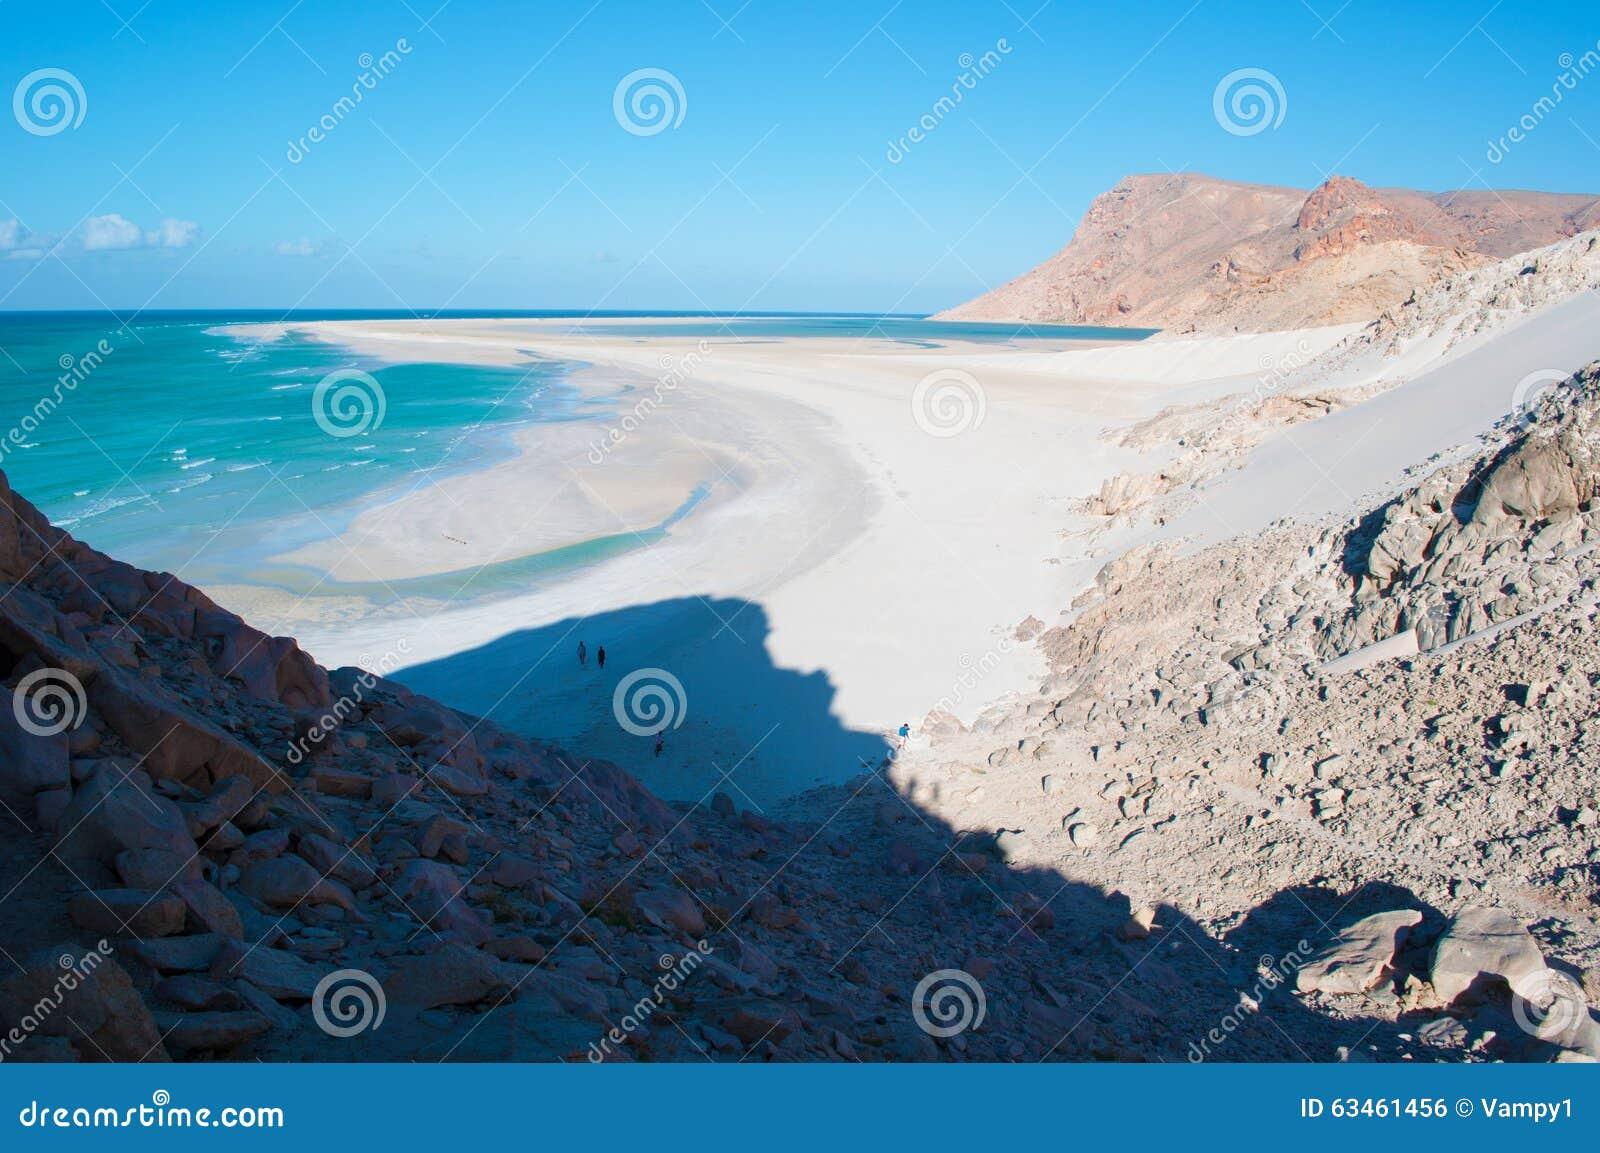 Ochraniający teren Qalansia plaża laguna, Socotra, Jemen